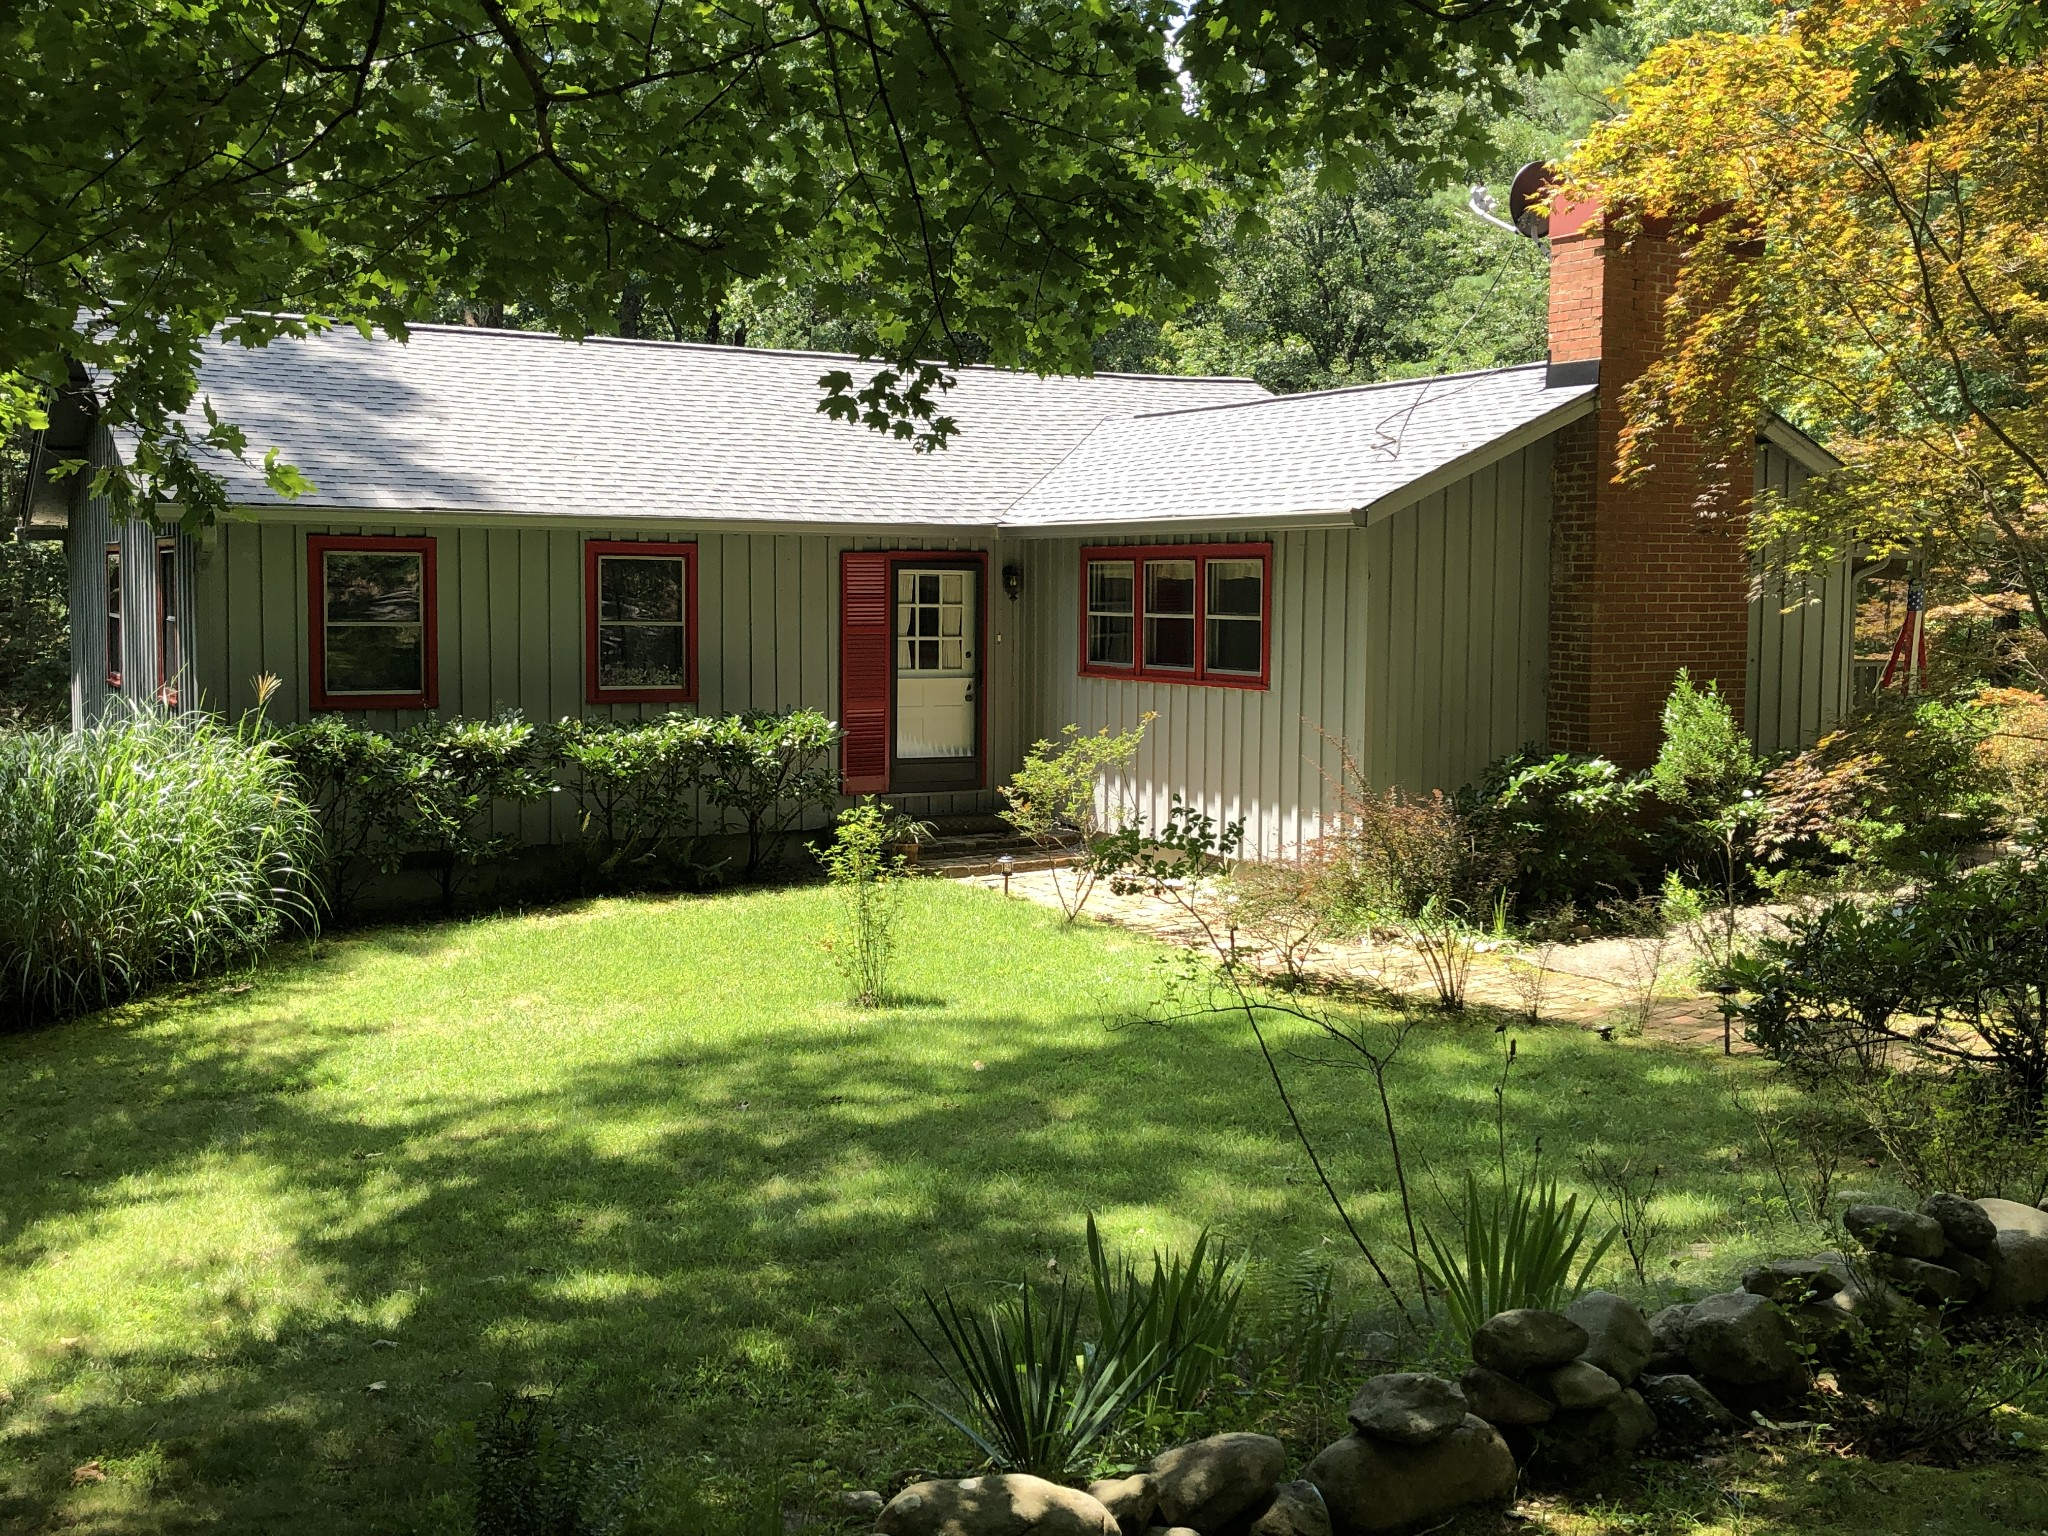 181 Kirby-Smith Rd Property Photo - Sewanee, TN real estate listing